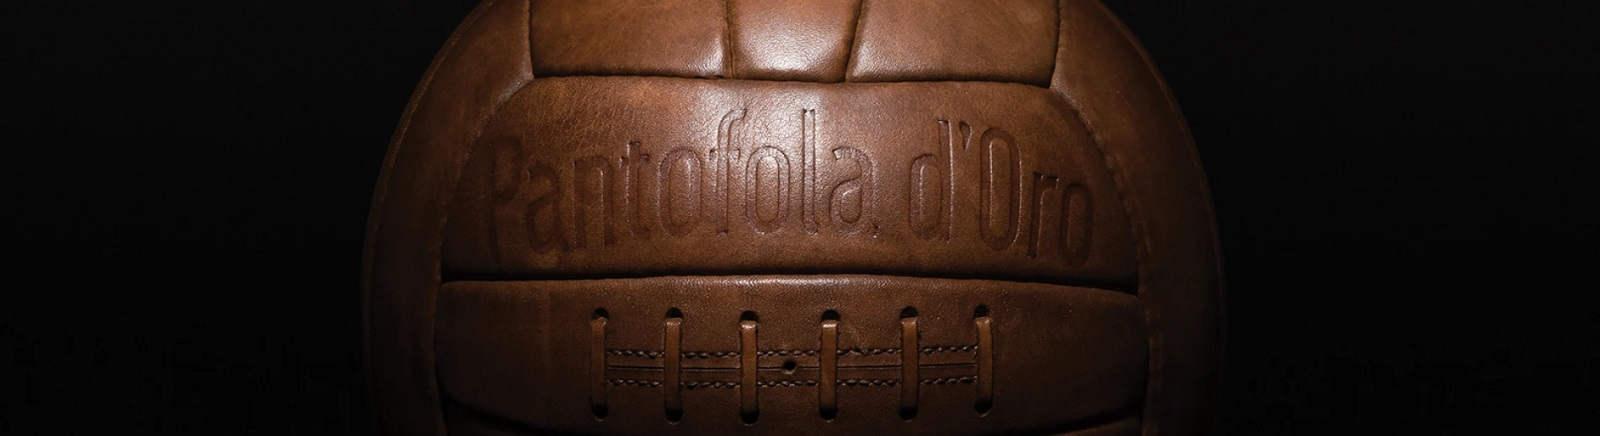 Pantofola d'Oro Herren Schuhe, Sneaker & mehr kaufen | GISY